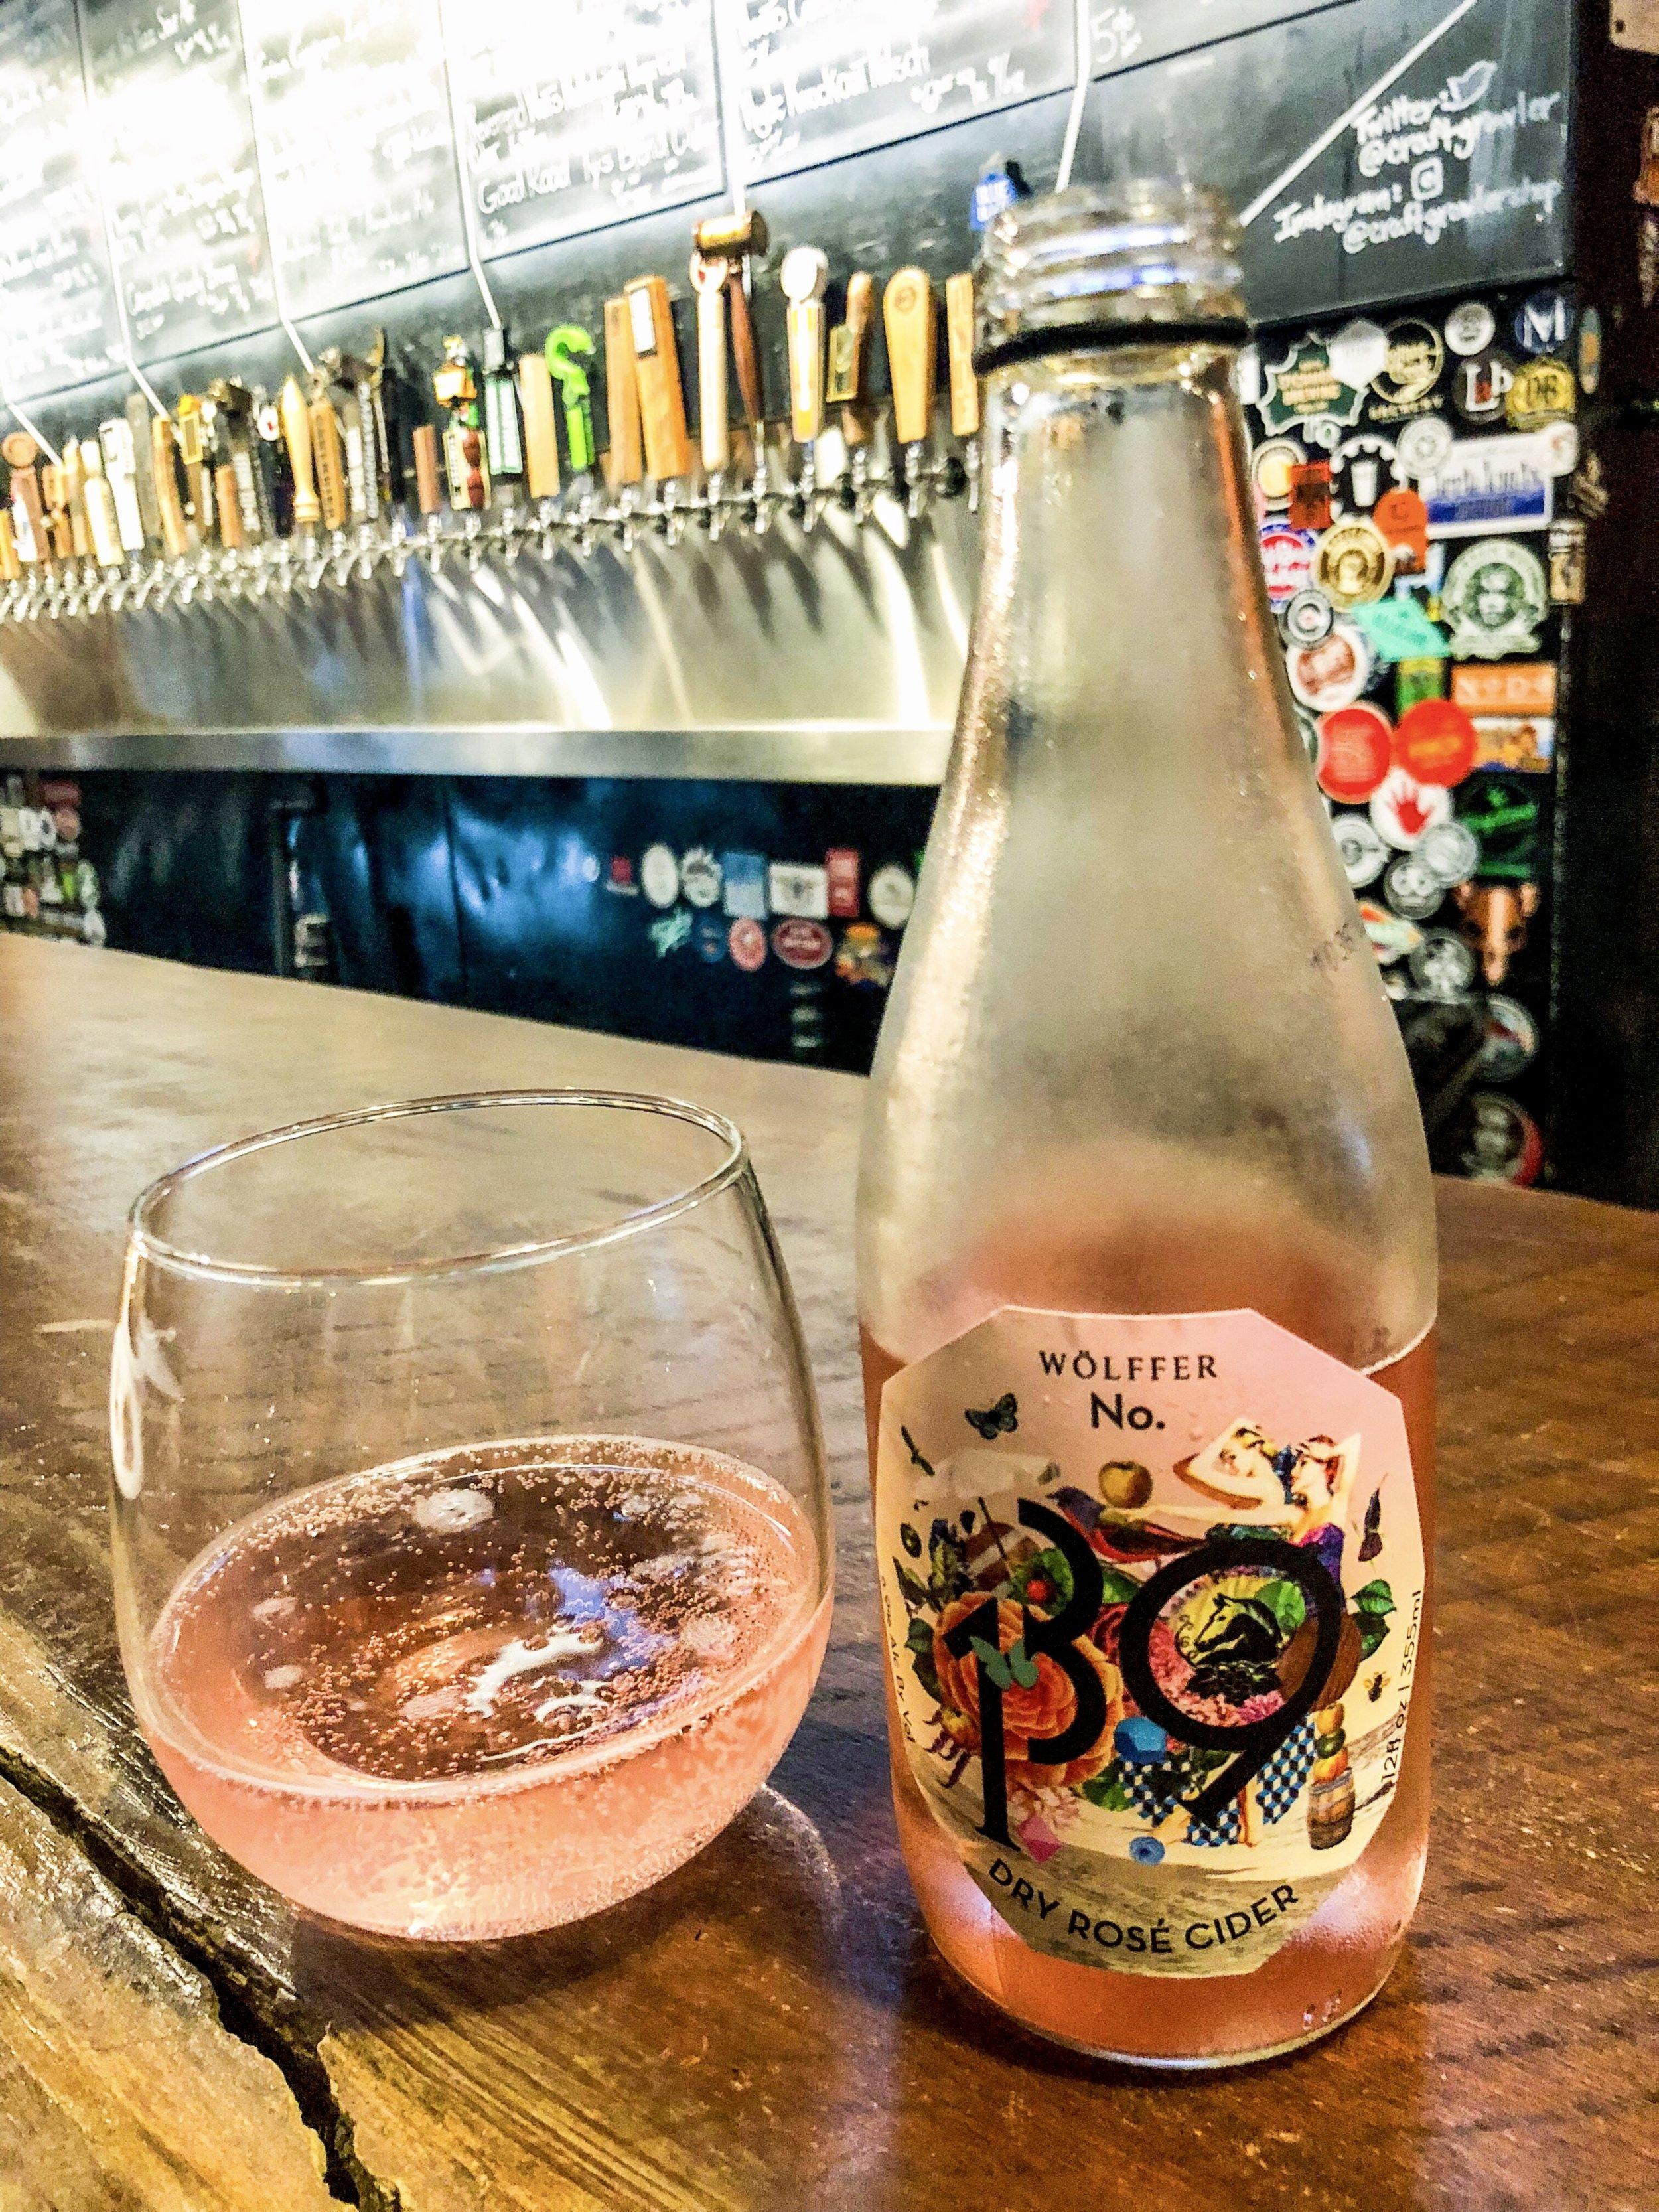 Wolffer-No-139-Dry-Cider-Craft-Charlotte.jpg